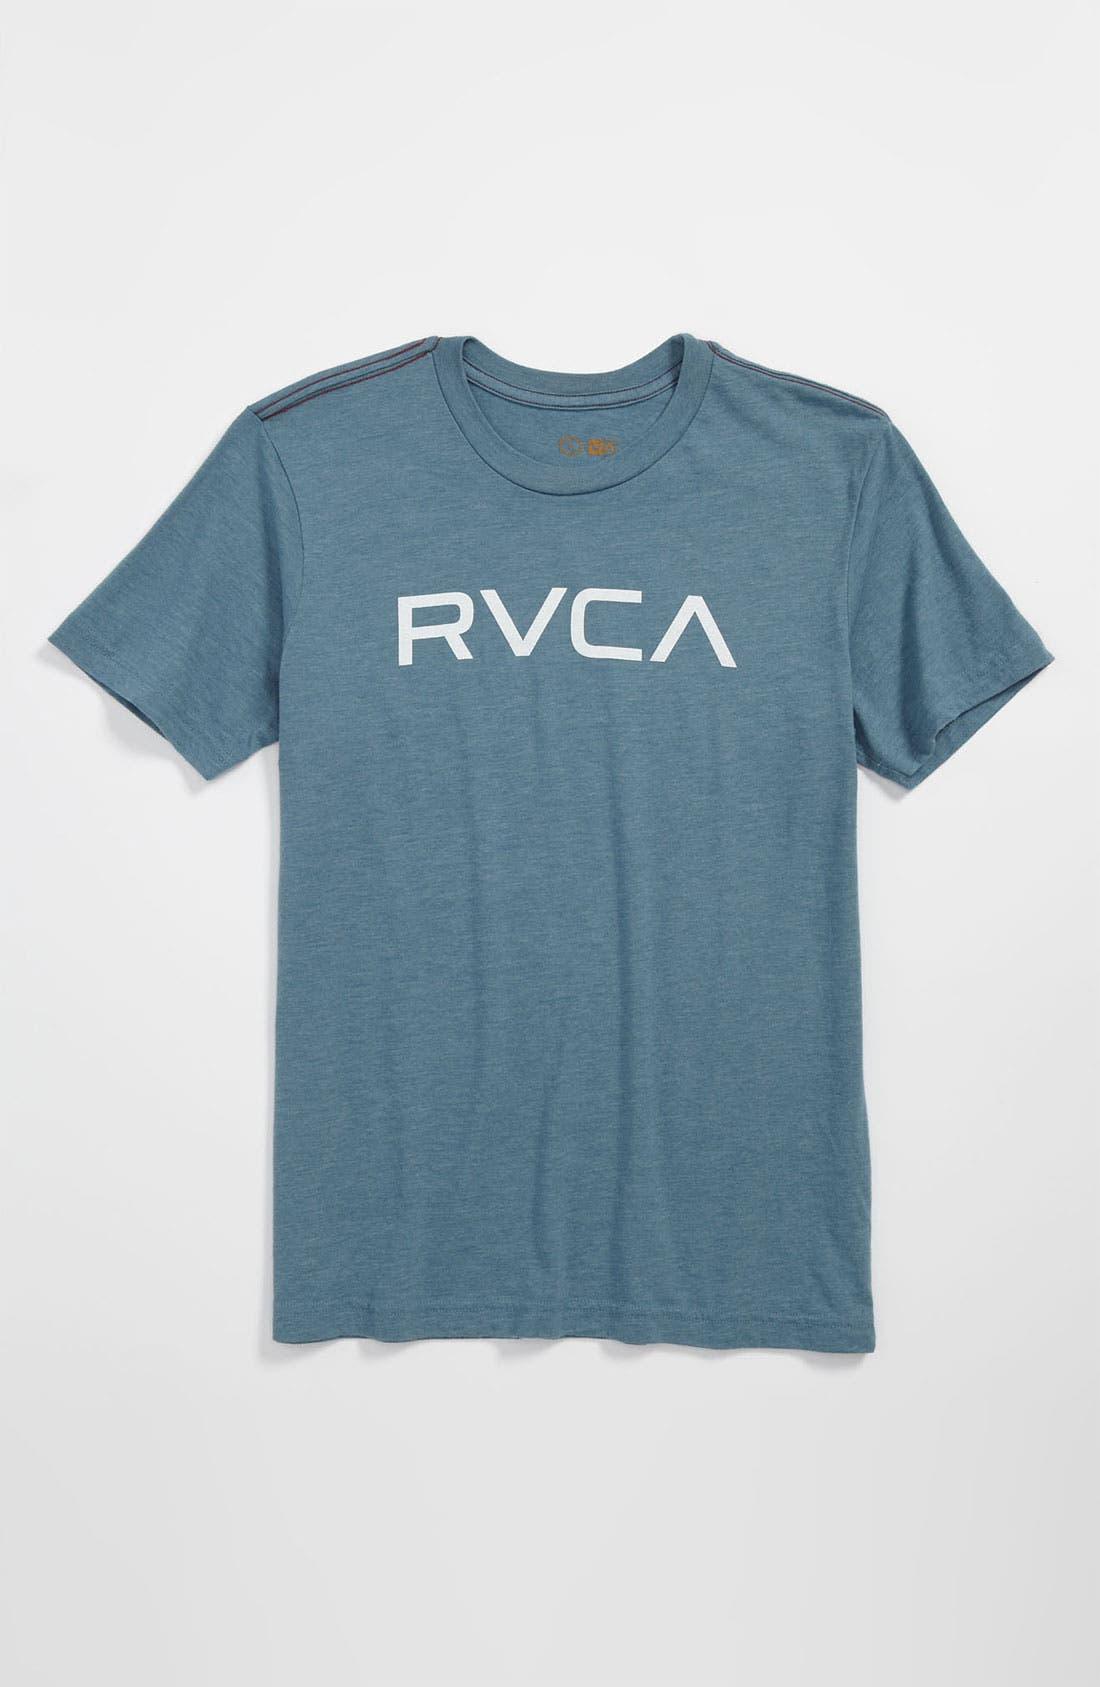 Main Image - RVCA 'Big' Graphic T-Shirt (Big Boys)